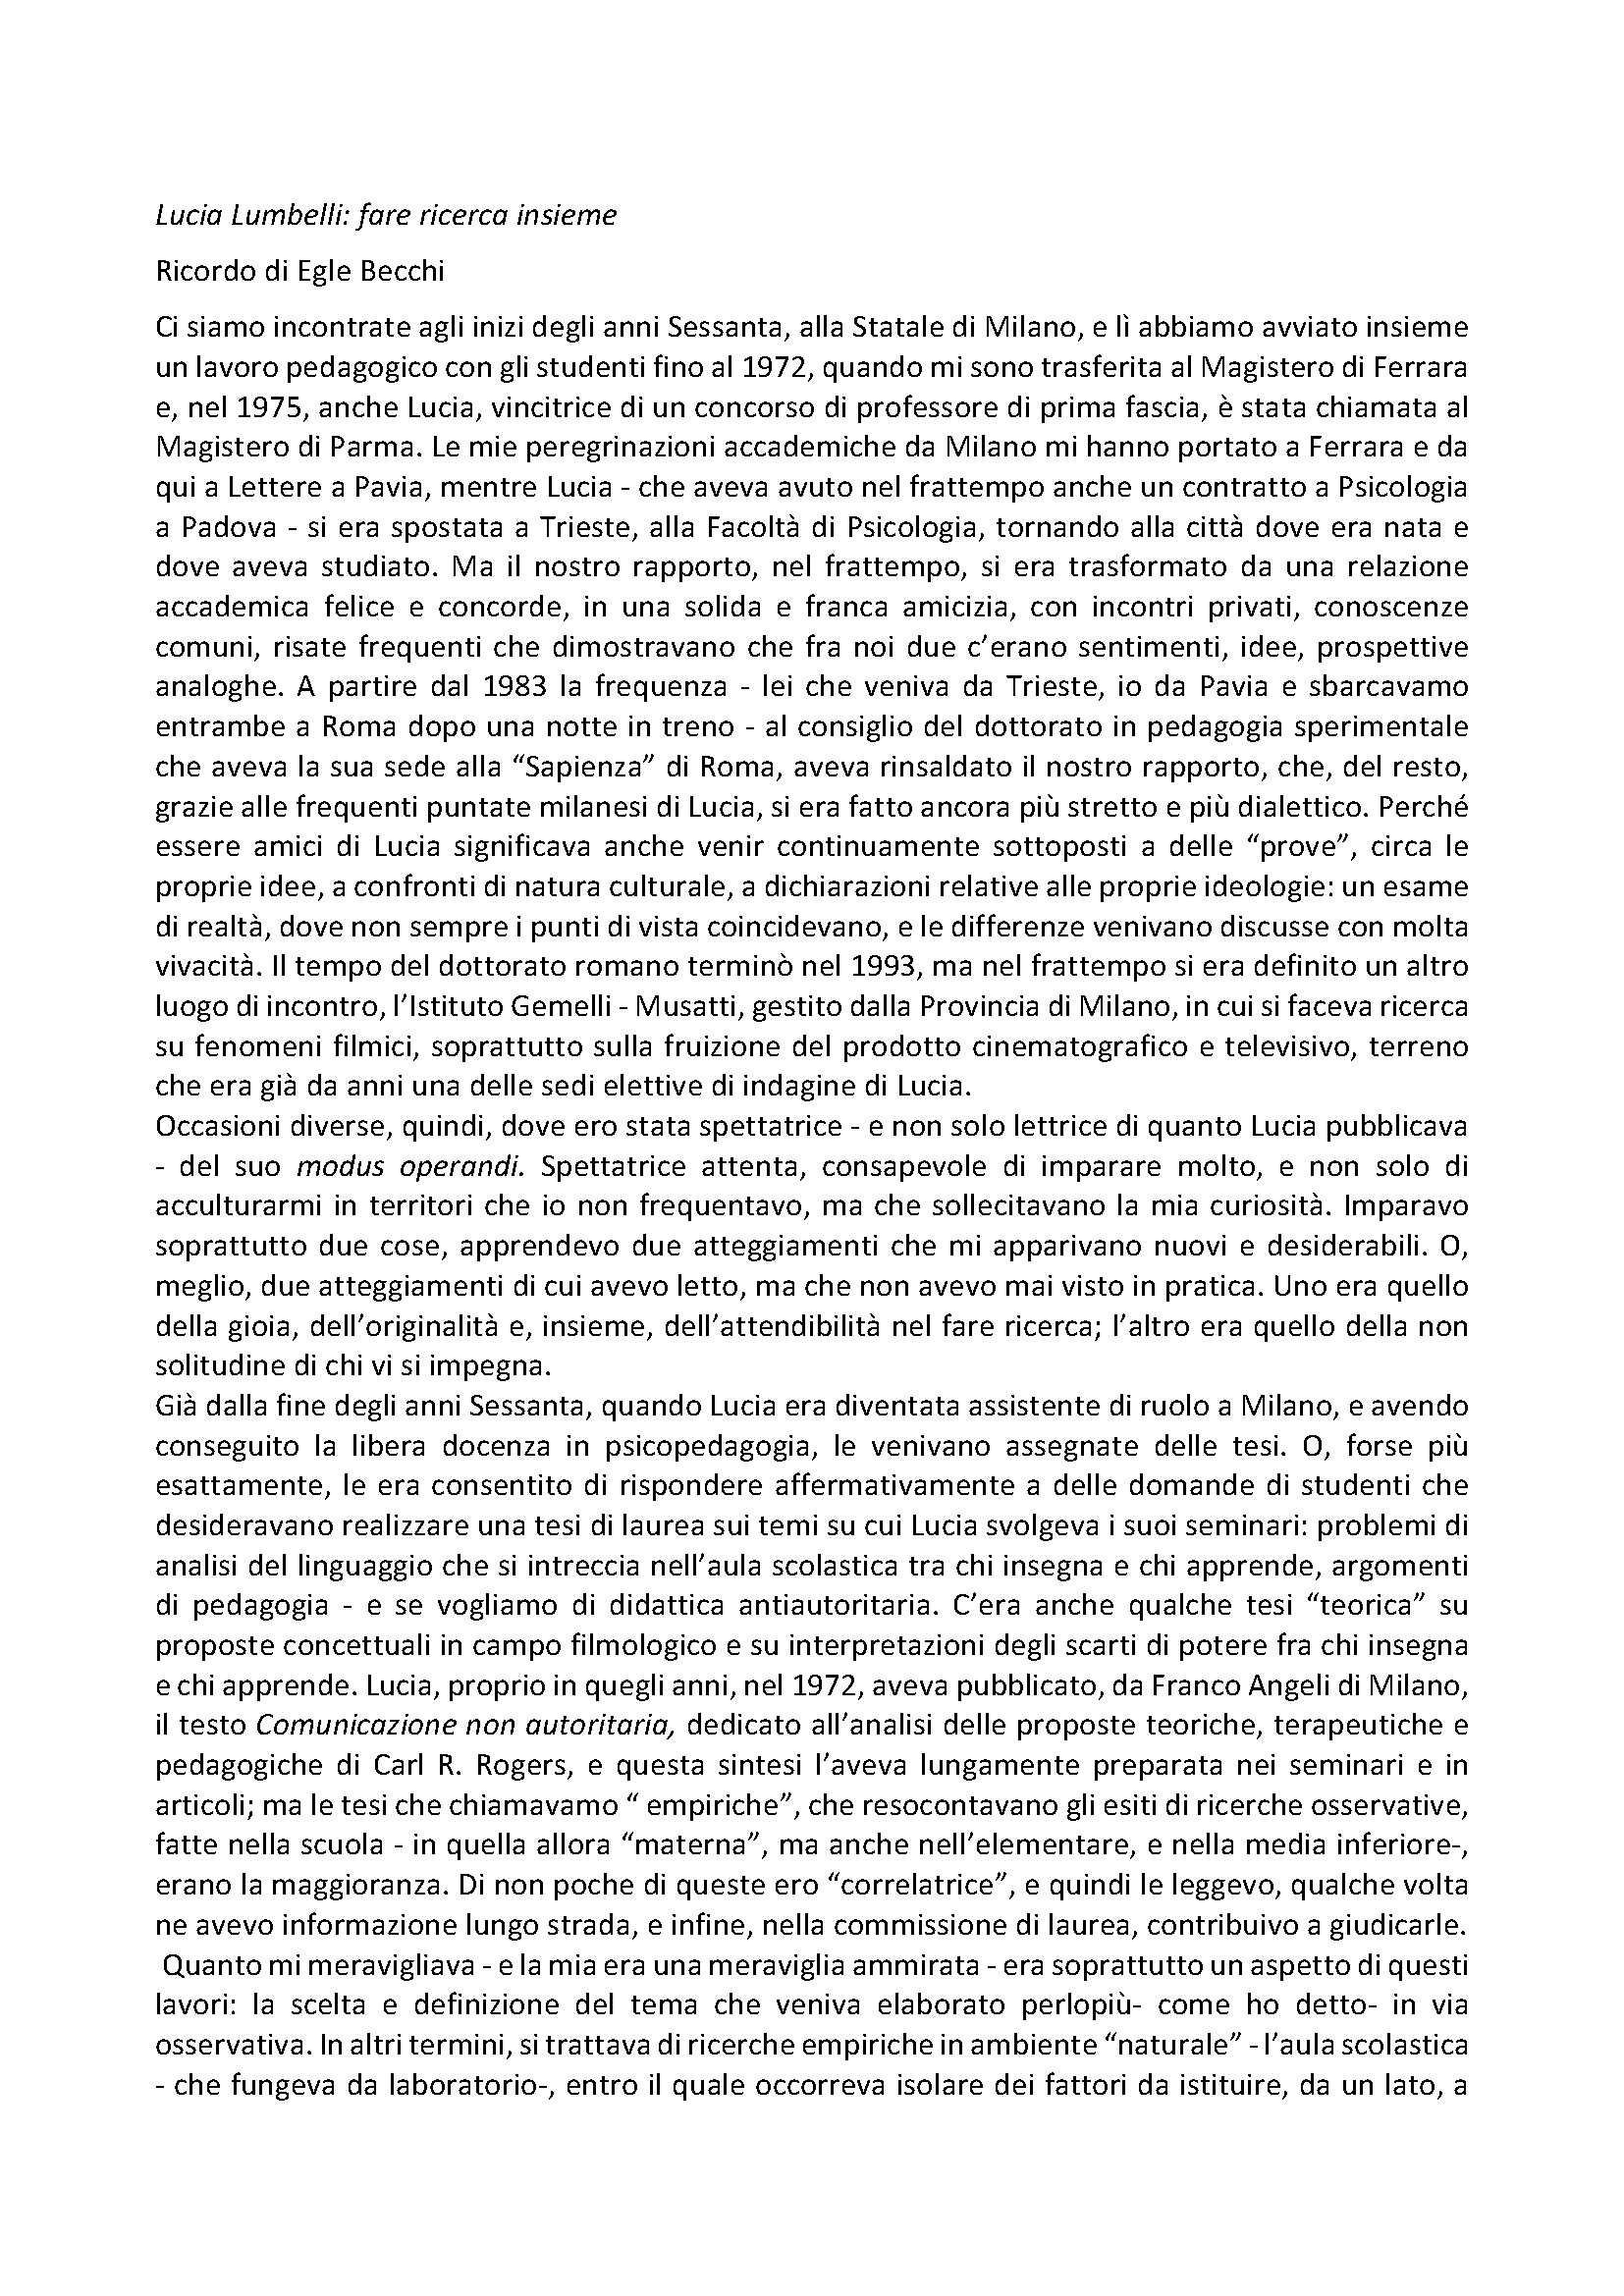 2019-03-18 – La scomparsa di Lucia Lumbelli